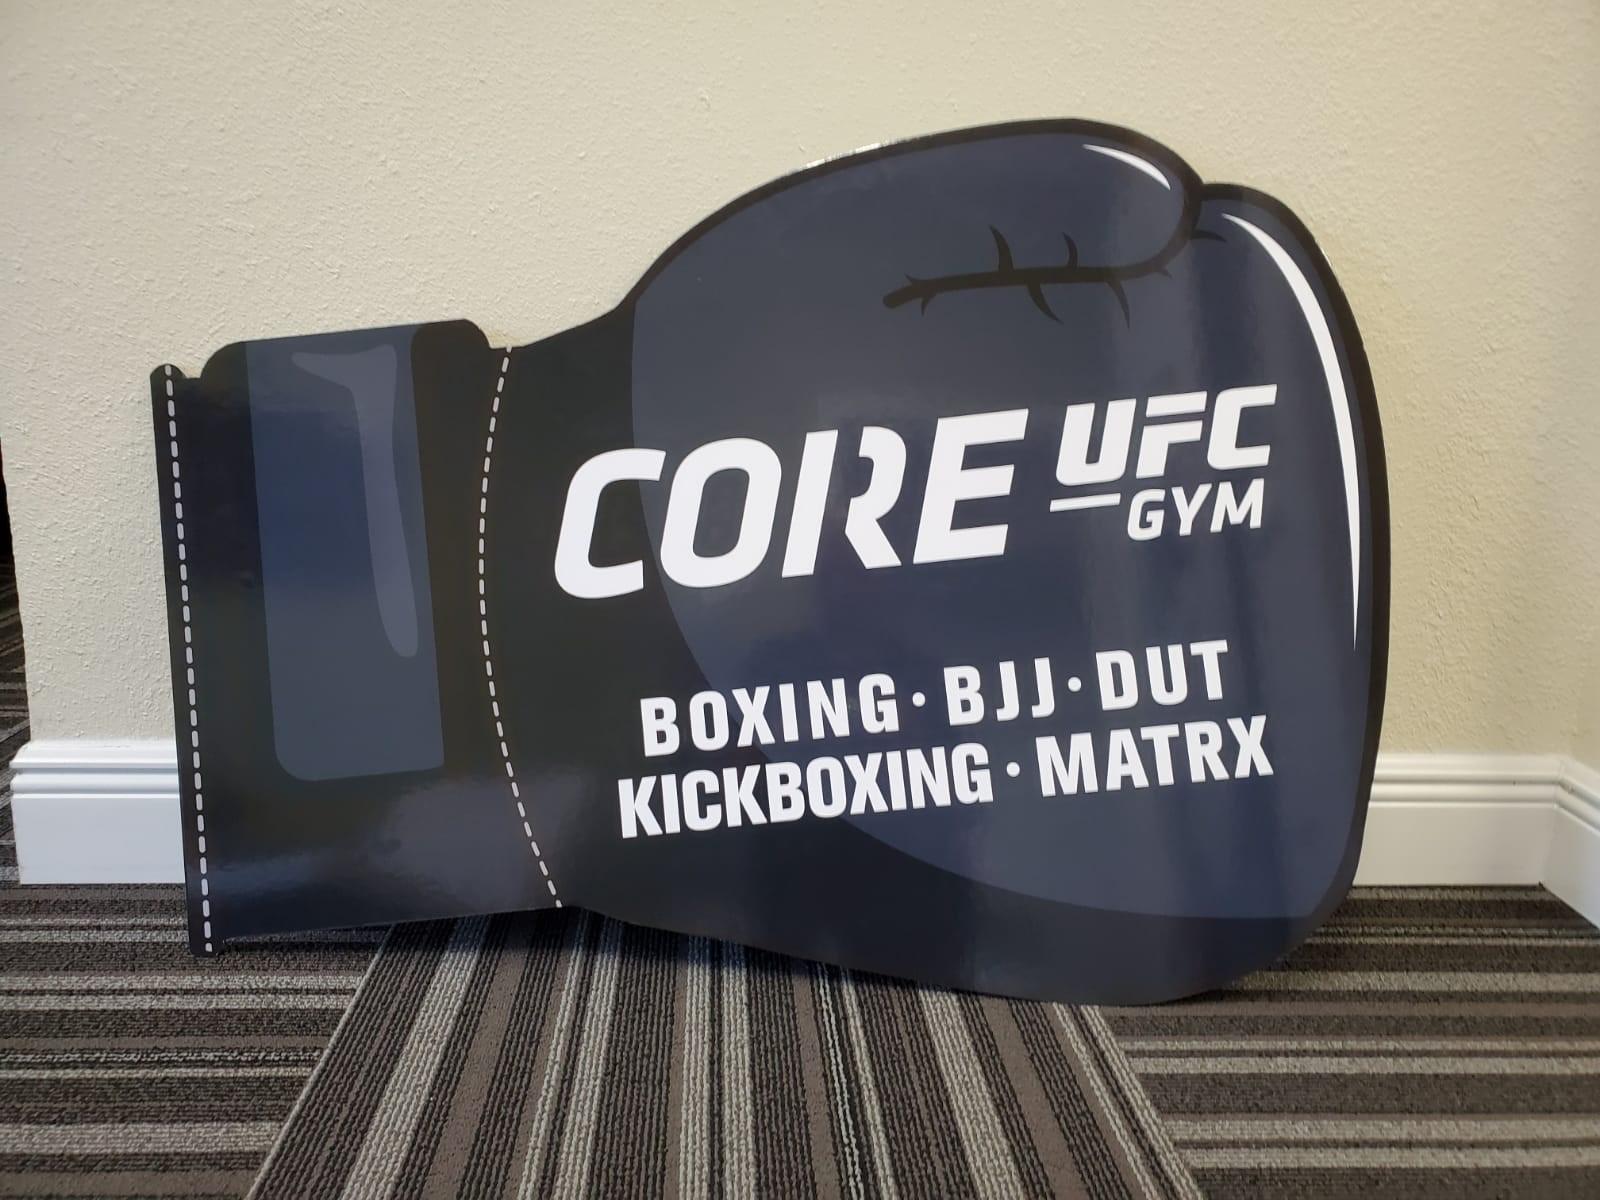 Plaques | Custom Signs & Signage | Gyms, Health Clubs, Fitness Facilities | Orlando , FL | UFC | Ginástica | Boxe | Gráfica brasileira | marketing